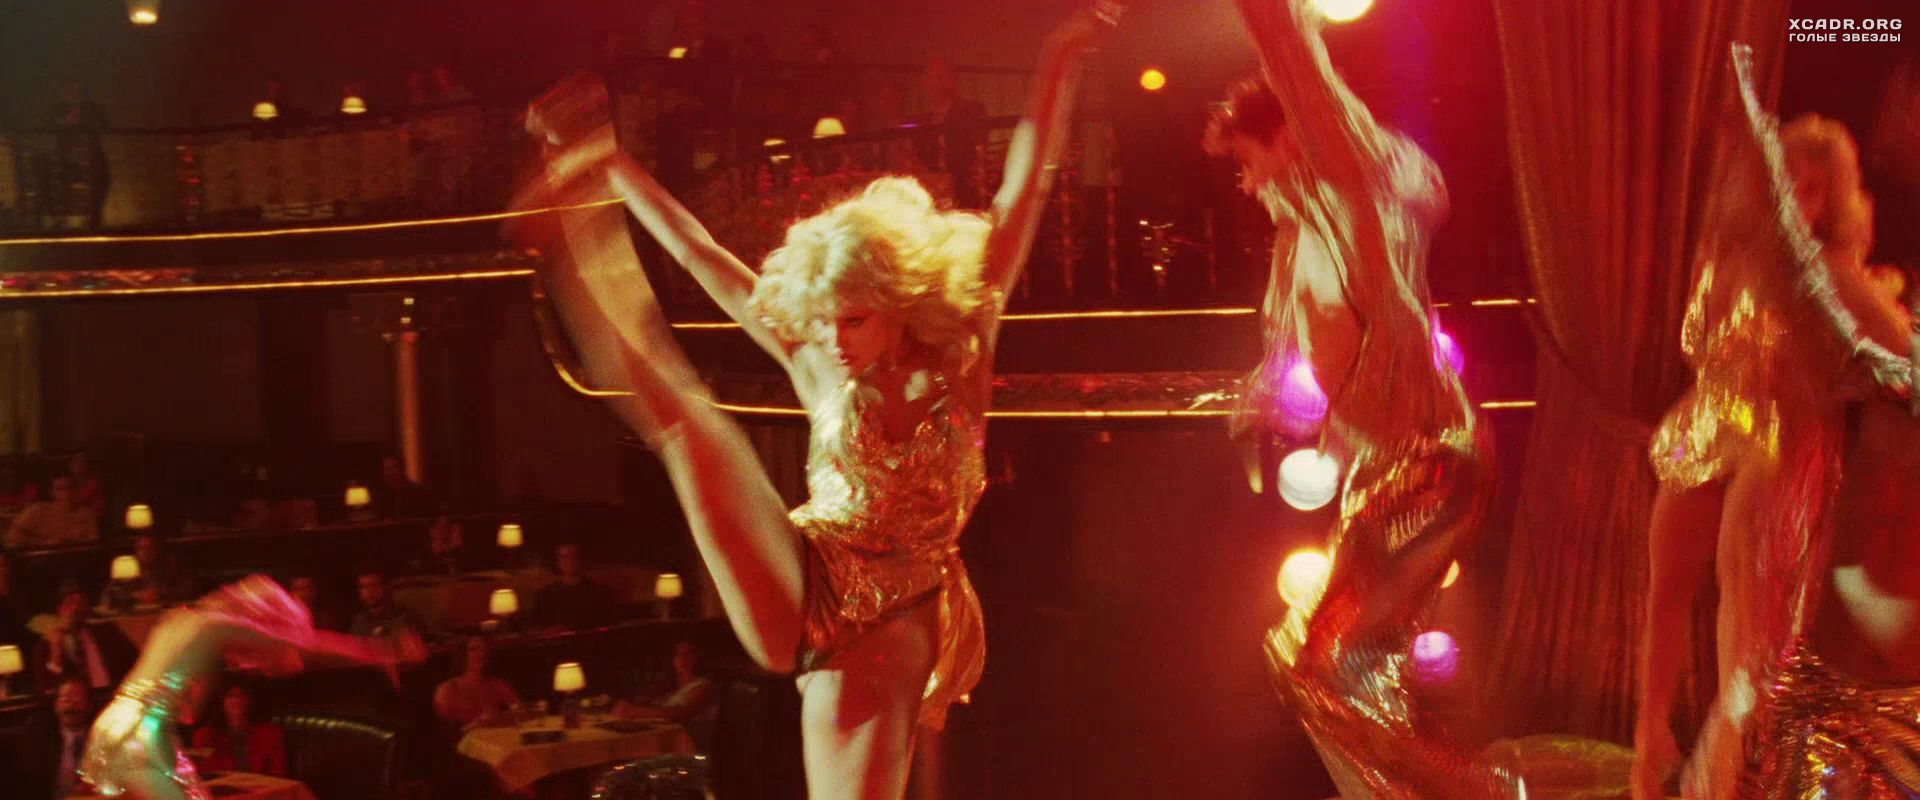 Showgirls sex scenes her ass locker